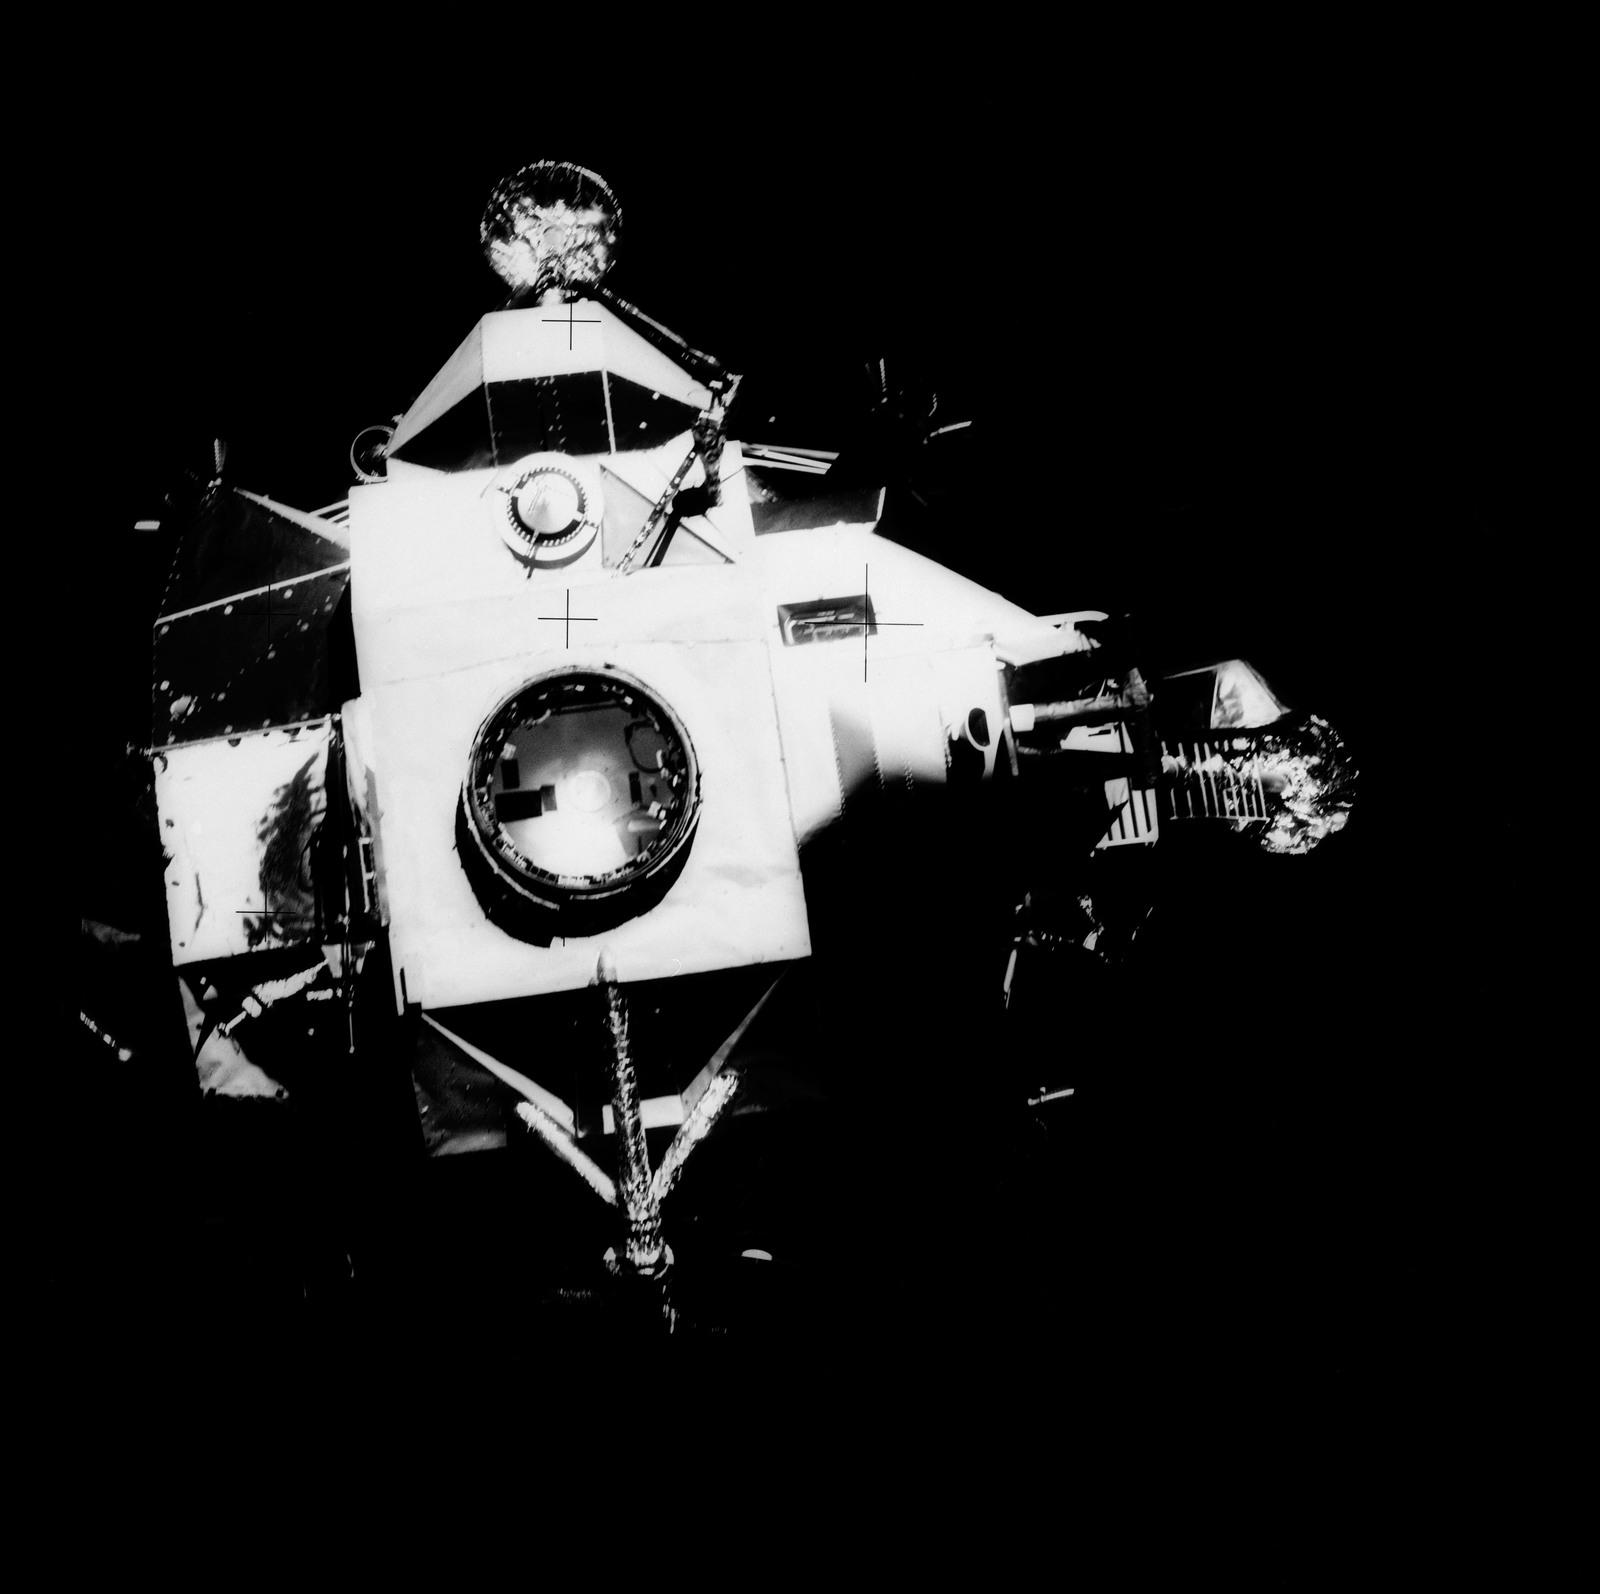 AS13-59-8562 - Apollo 13 - Apollo 13 Missionsbild - Ansicht des Mondmoduls  (LM), das sich vom Command Service Modul (CSM) trennt. - U.S. National  Archives & DVIDS Public Domain-Suche